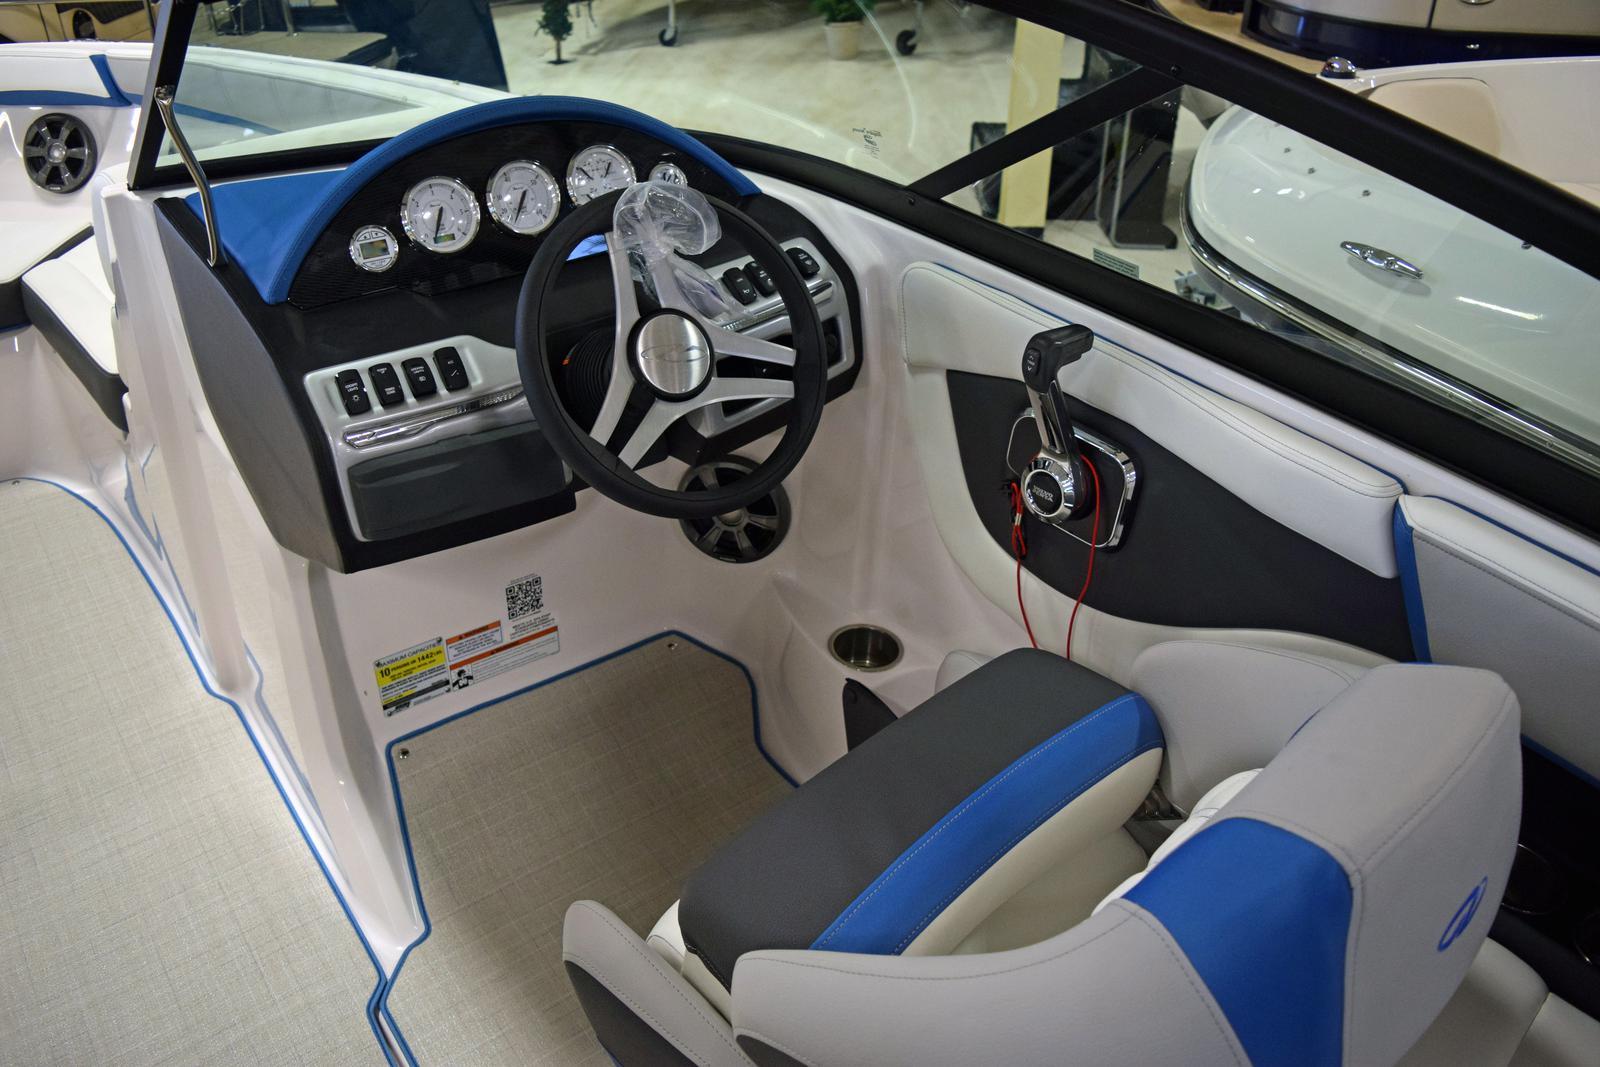 2020 Regal 2000 ES for sale in Indianapolis, IN  Marine